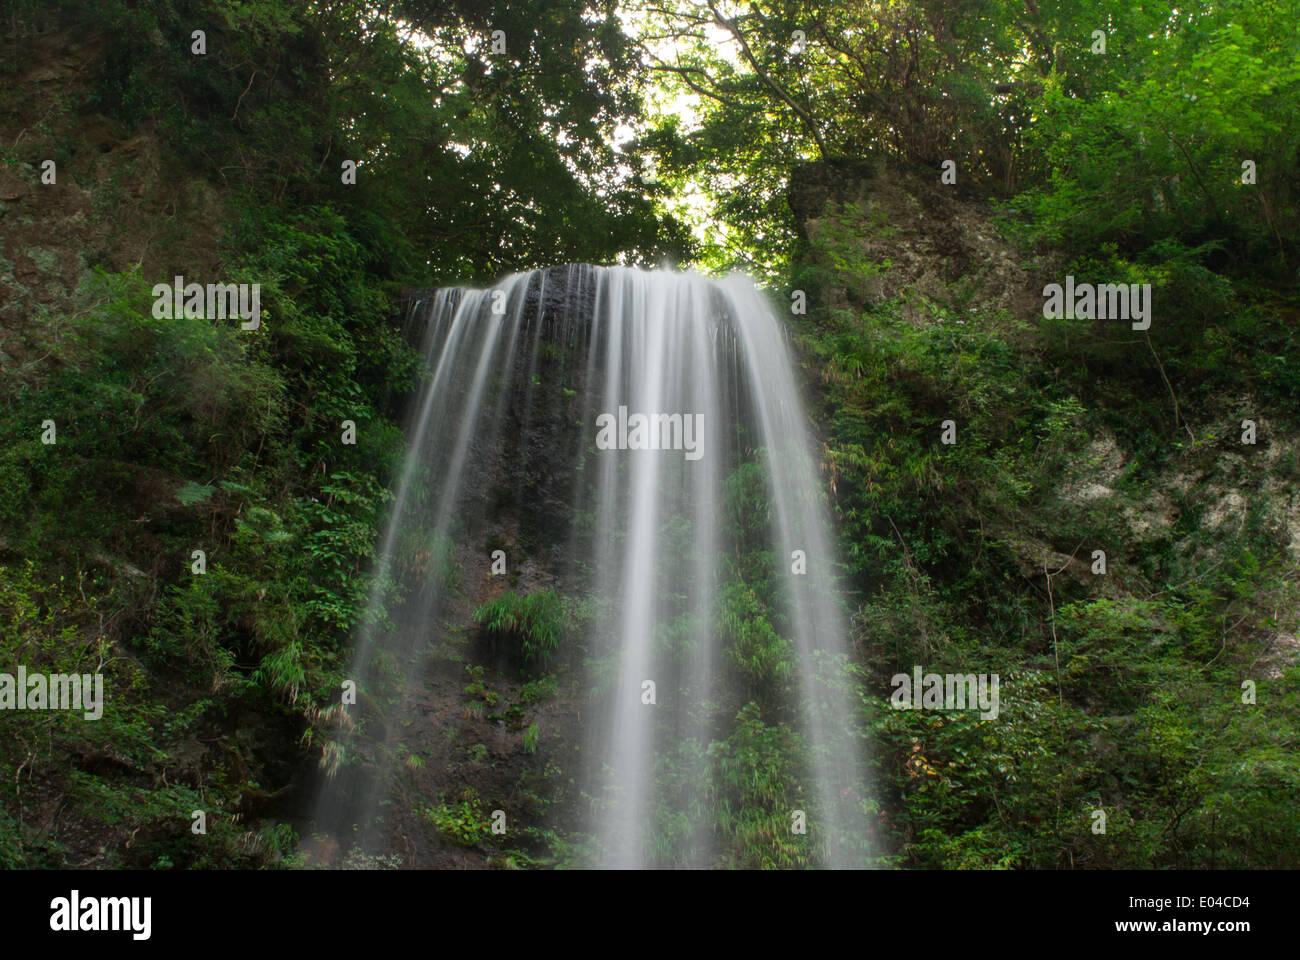 Yuhi Waterfall, Kanagawa Prefecture, Japan Stock Photo